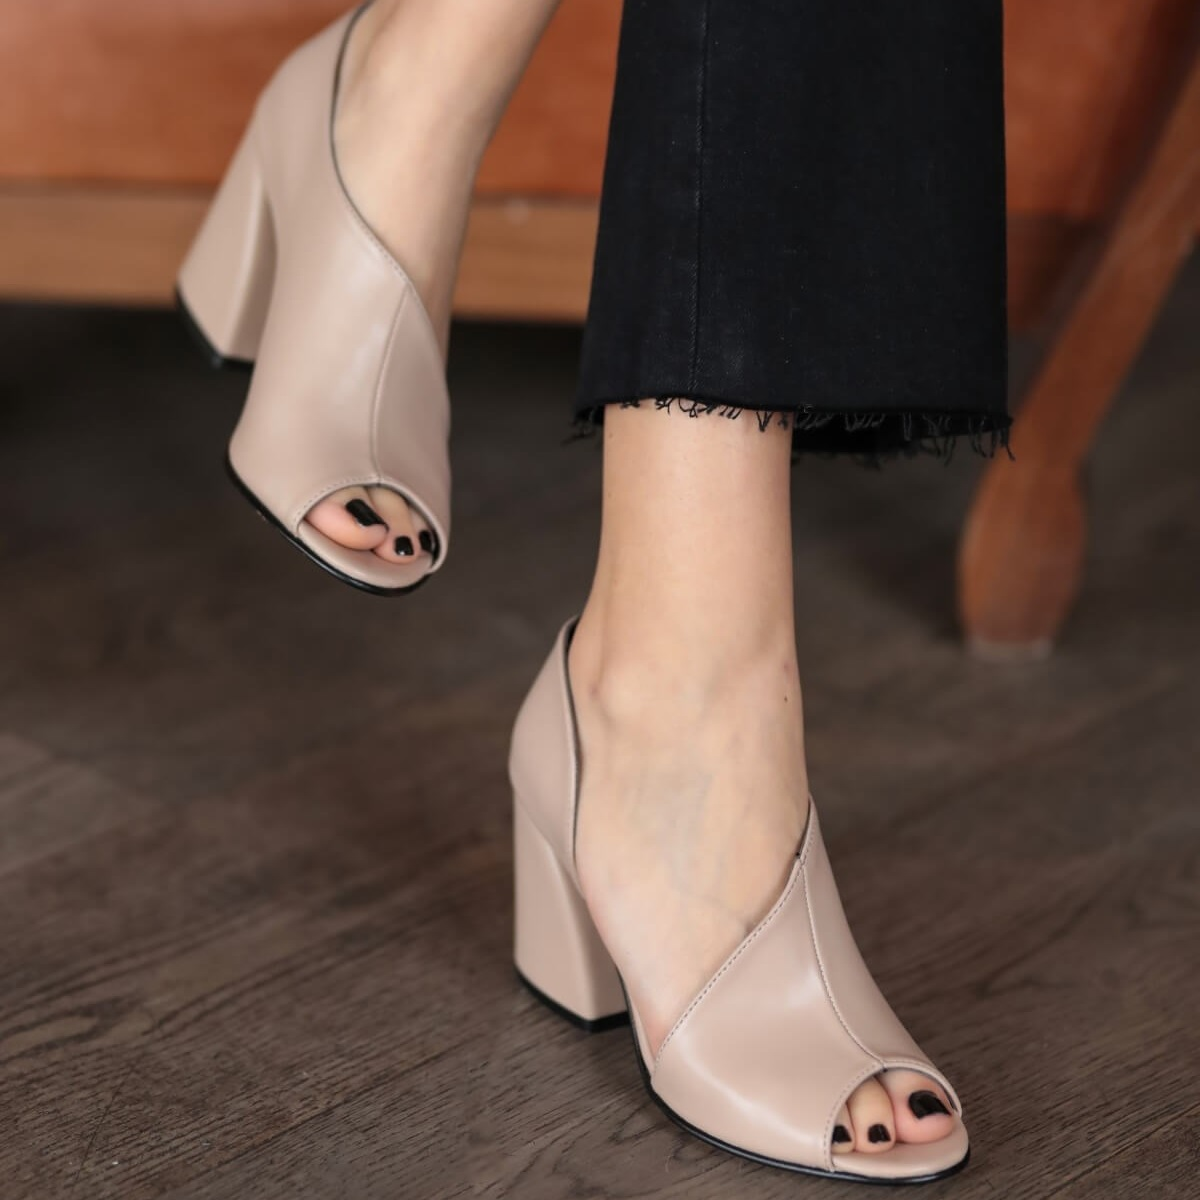 Mio Gusto Brand EVA, Black / Skin / Powder / White/Tan, top Selling 9Cm Heel height Women 's Quality Pumps Shoes